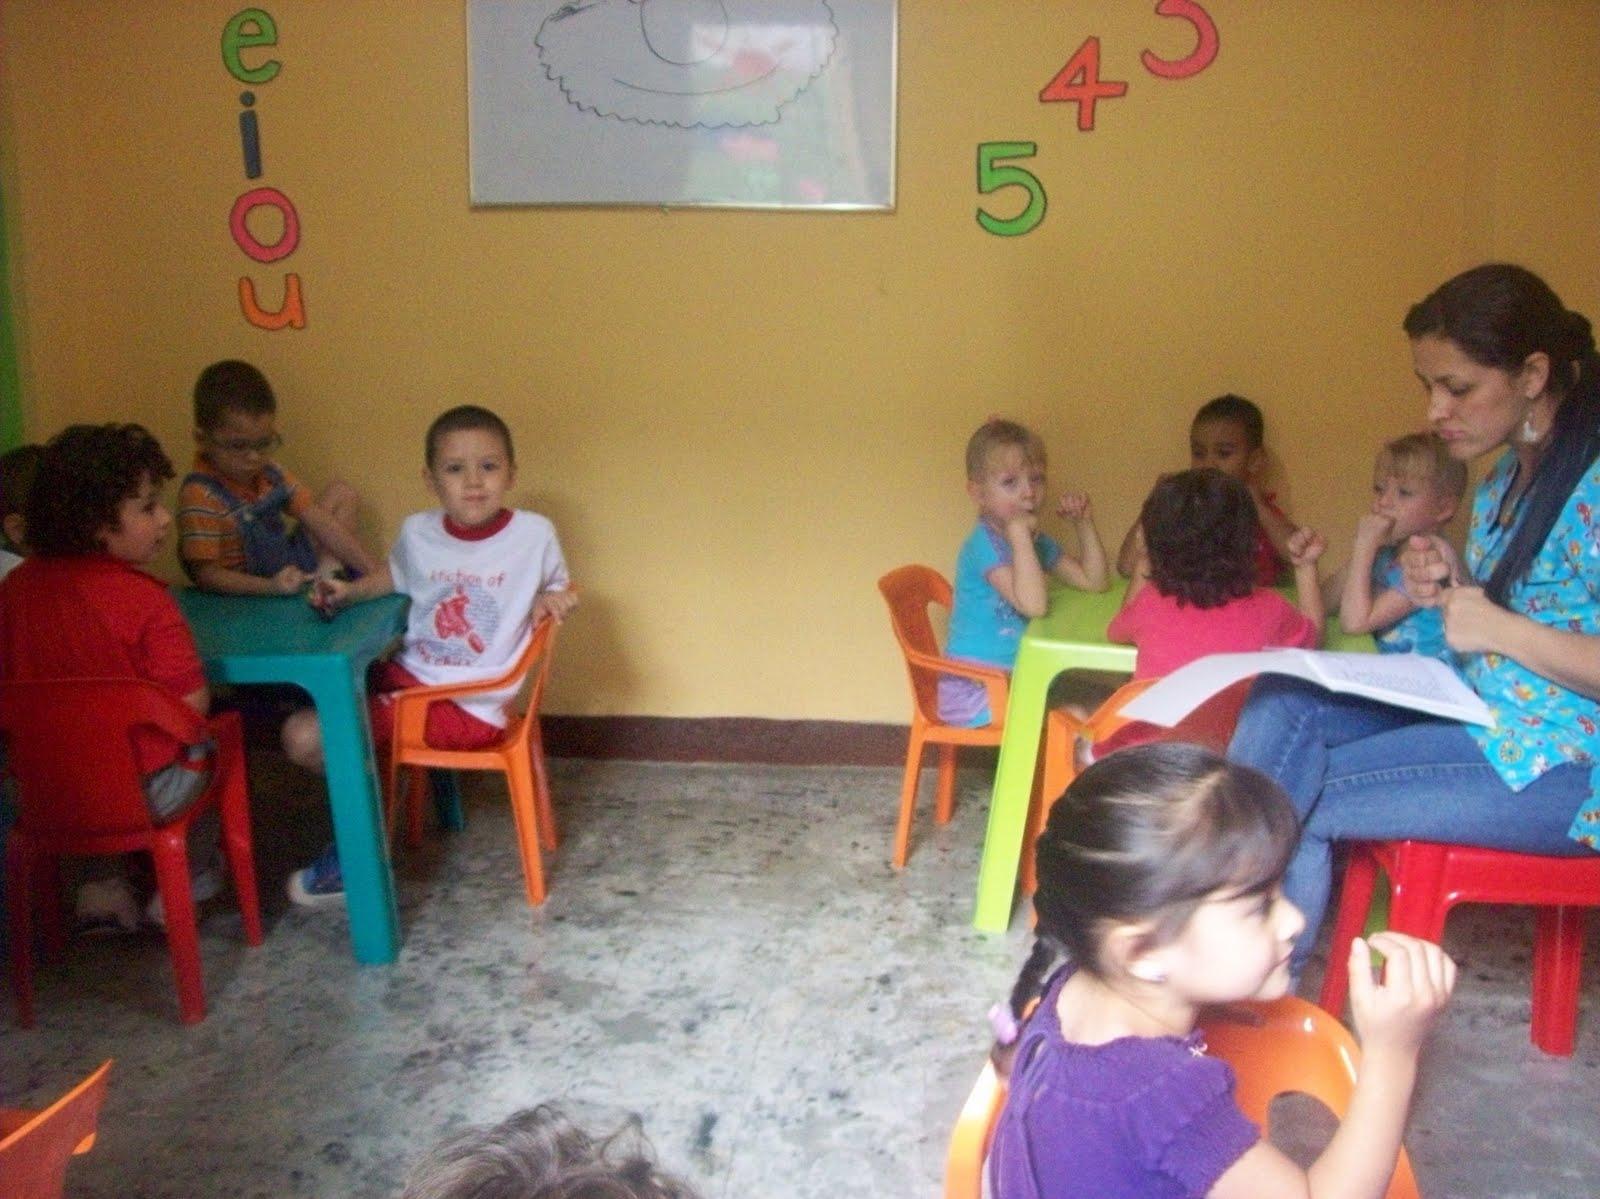 Jardin infantil la magia de aprender jugando for Aprendemos jugando jardin infantil